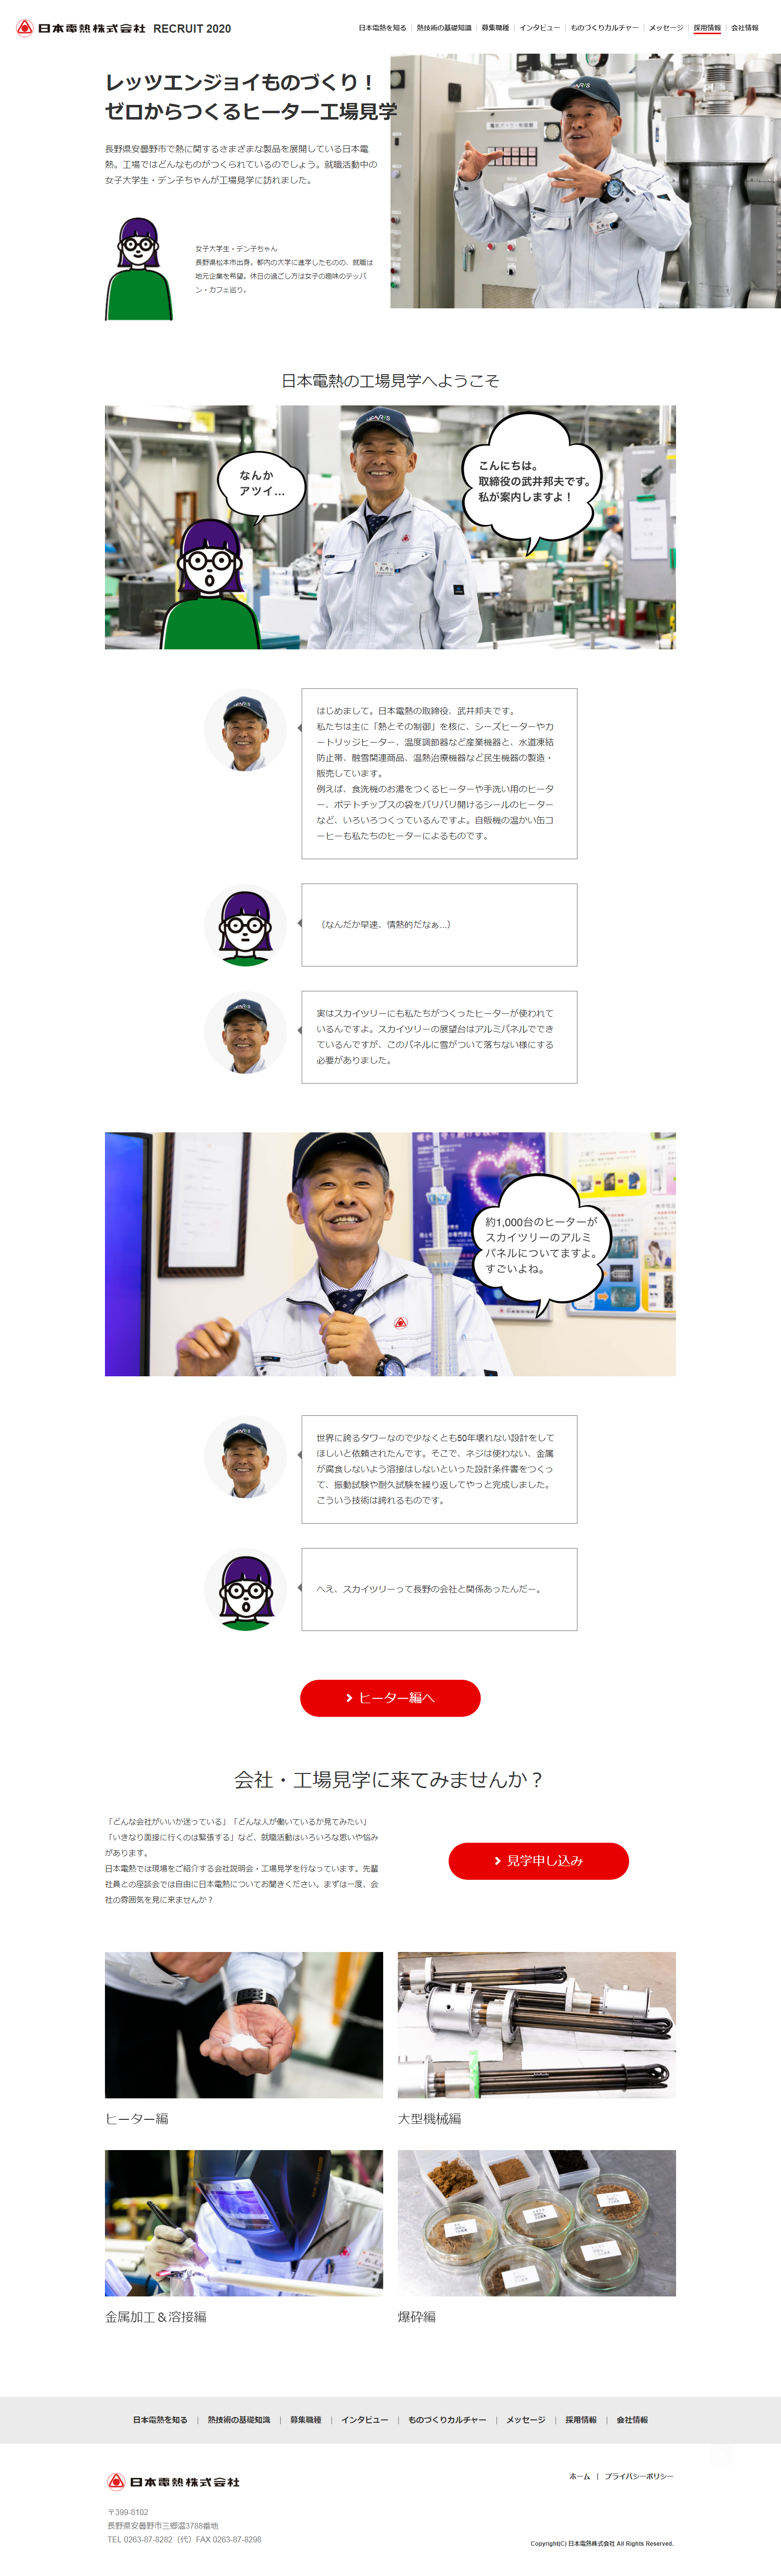 screencapture-nichinetu-recruit-jp-recruit-tour-2019-03-19-20_00_25